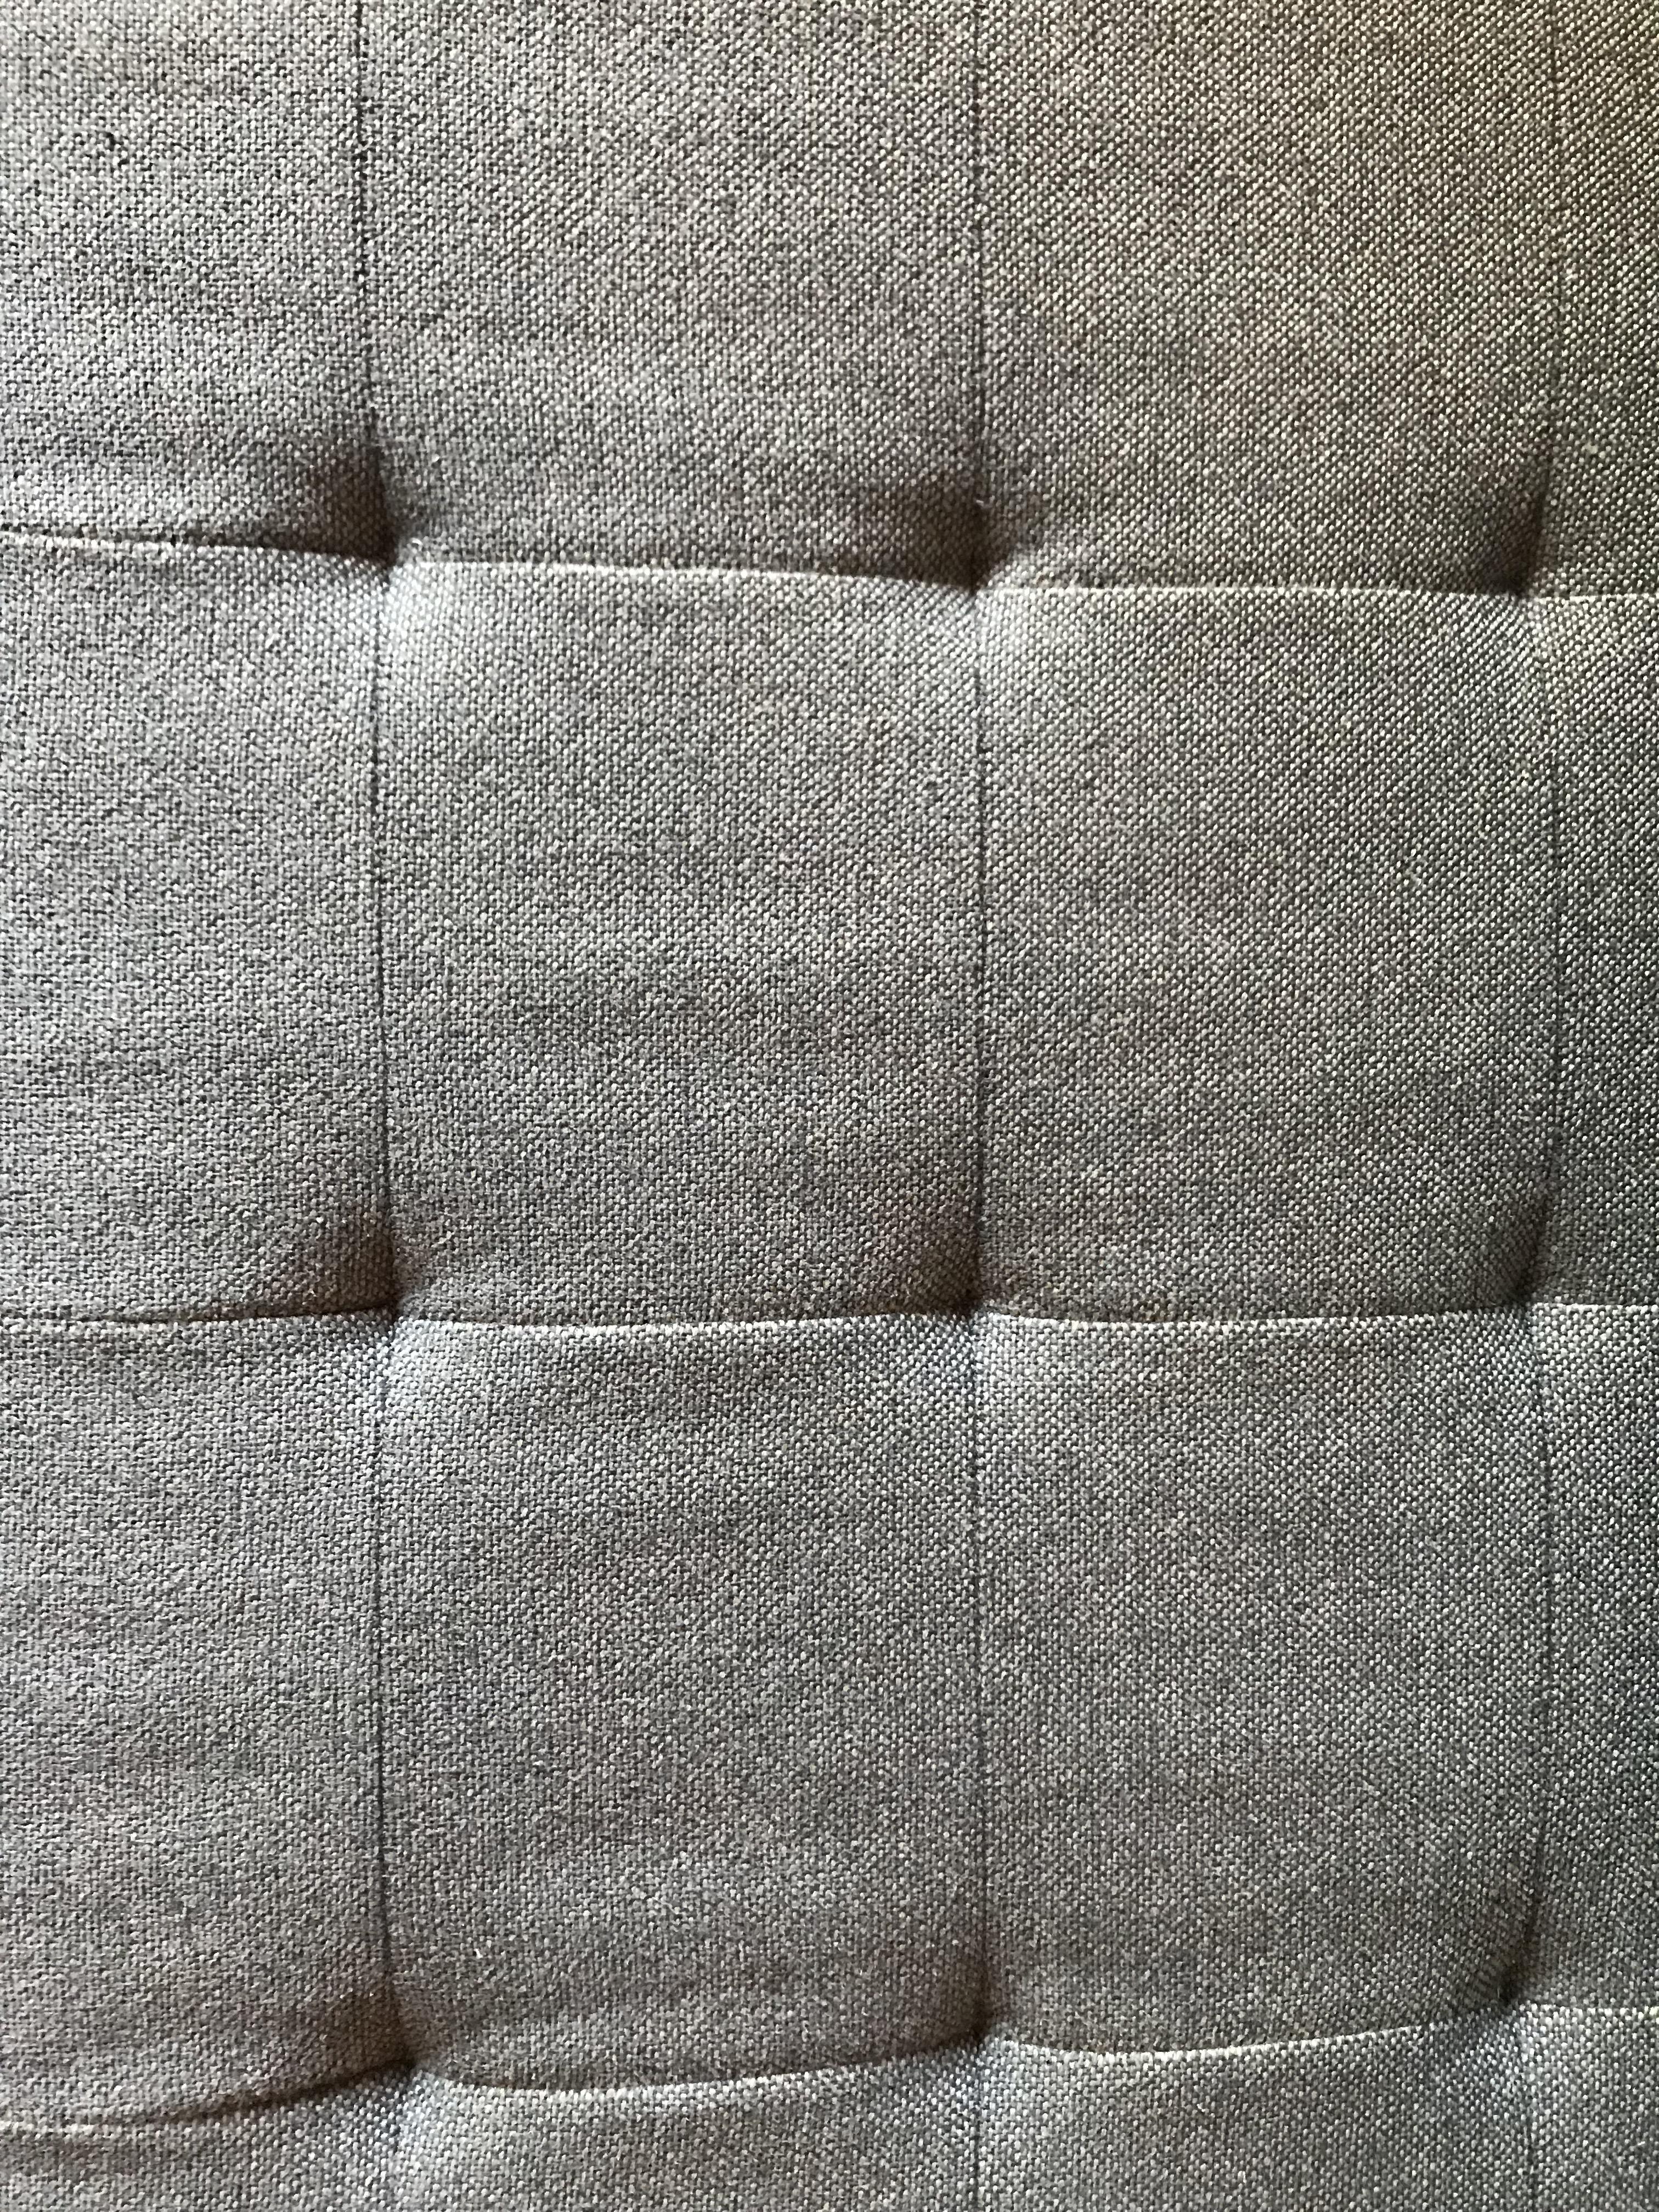 Mid Century Modern Blu Dot Gray Paramount Sofa   Image 5 Of 6